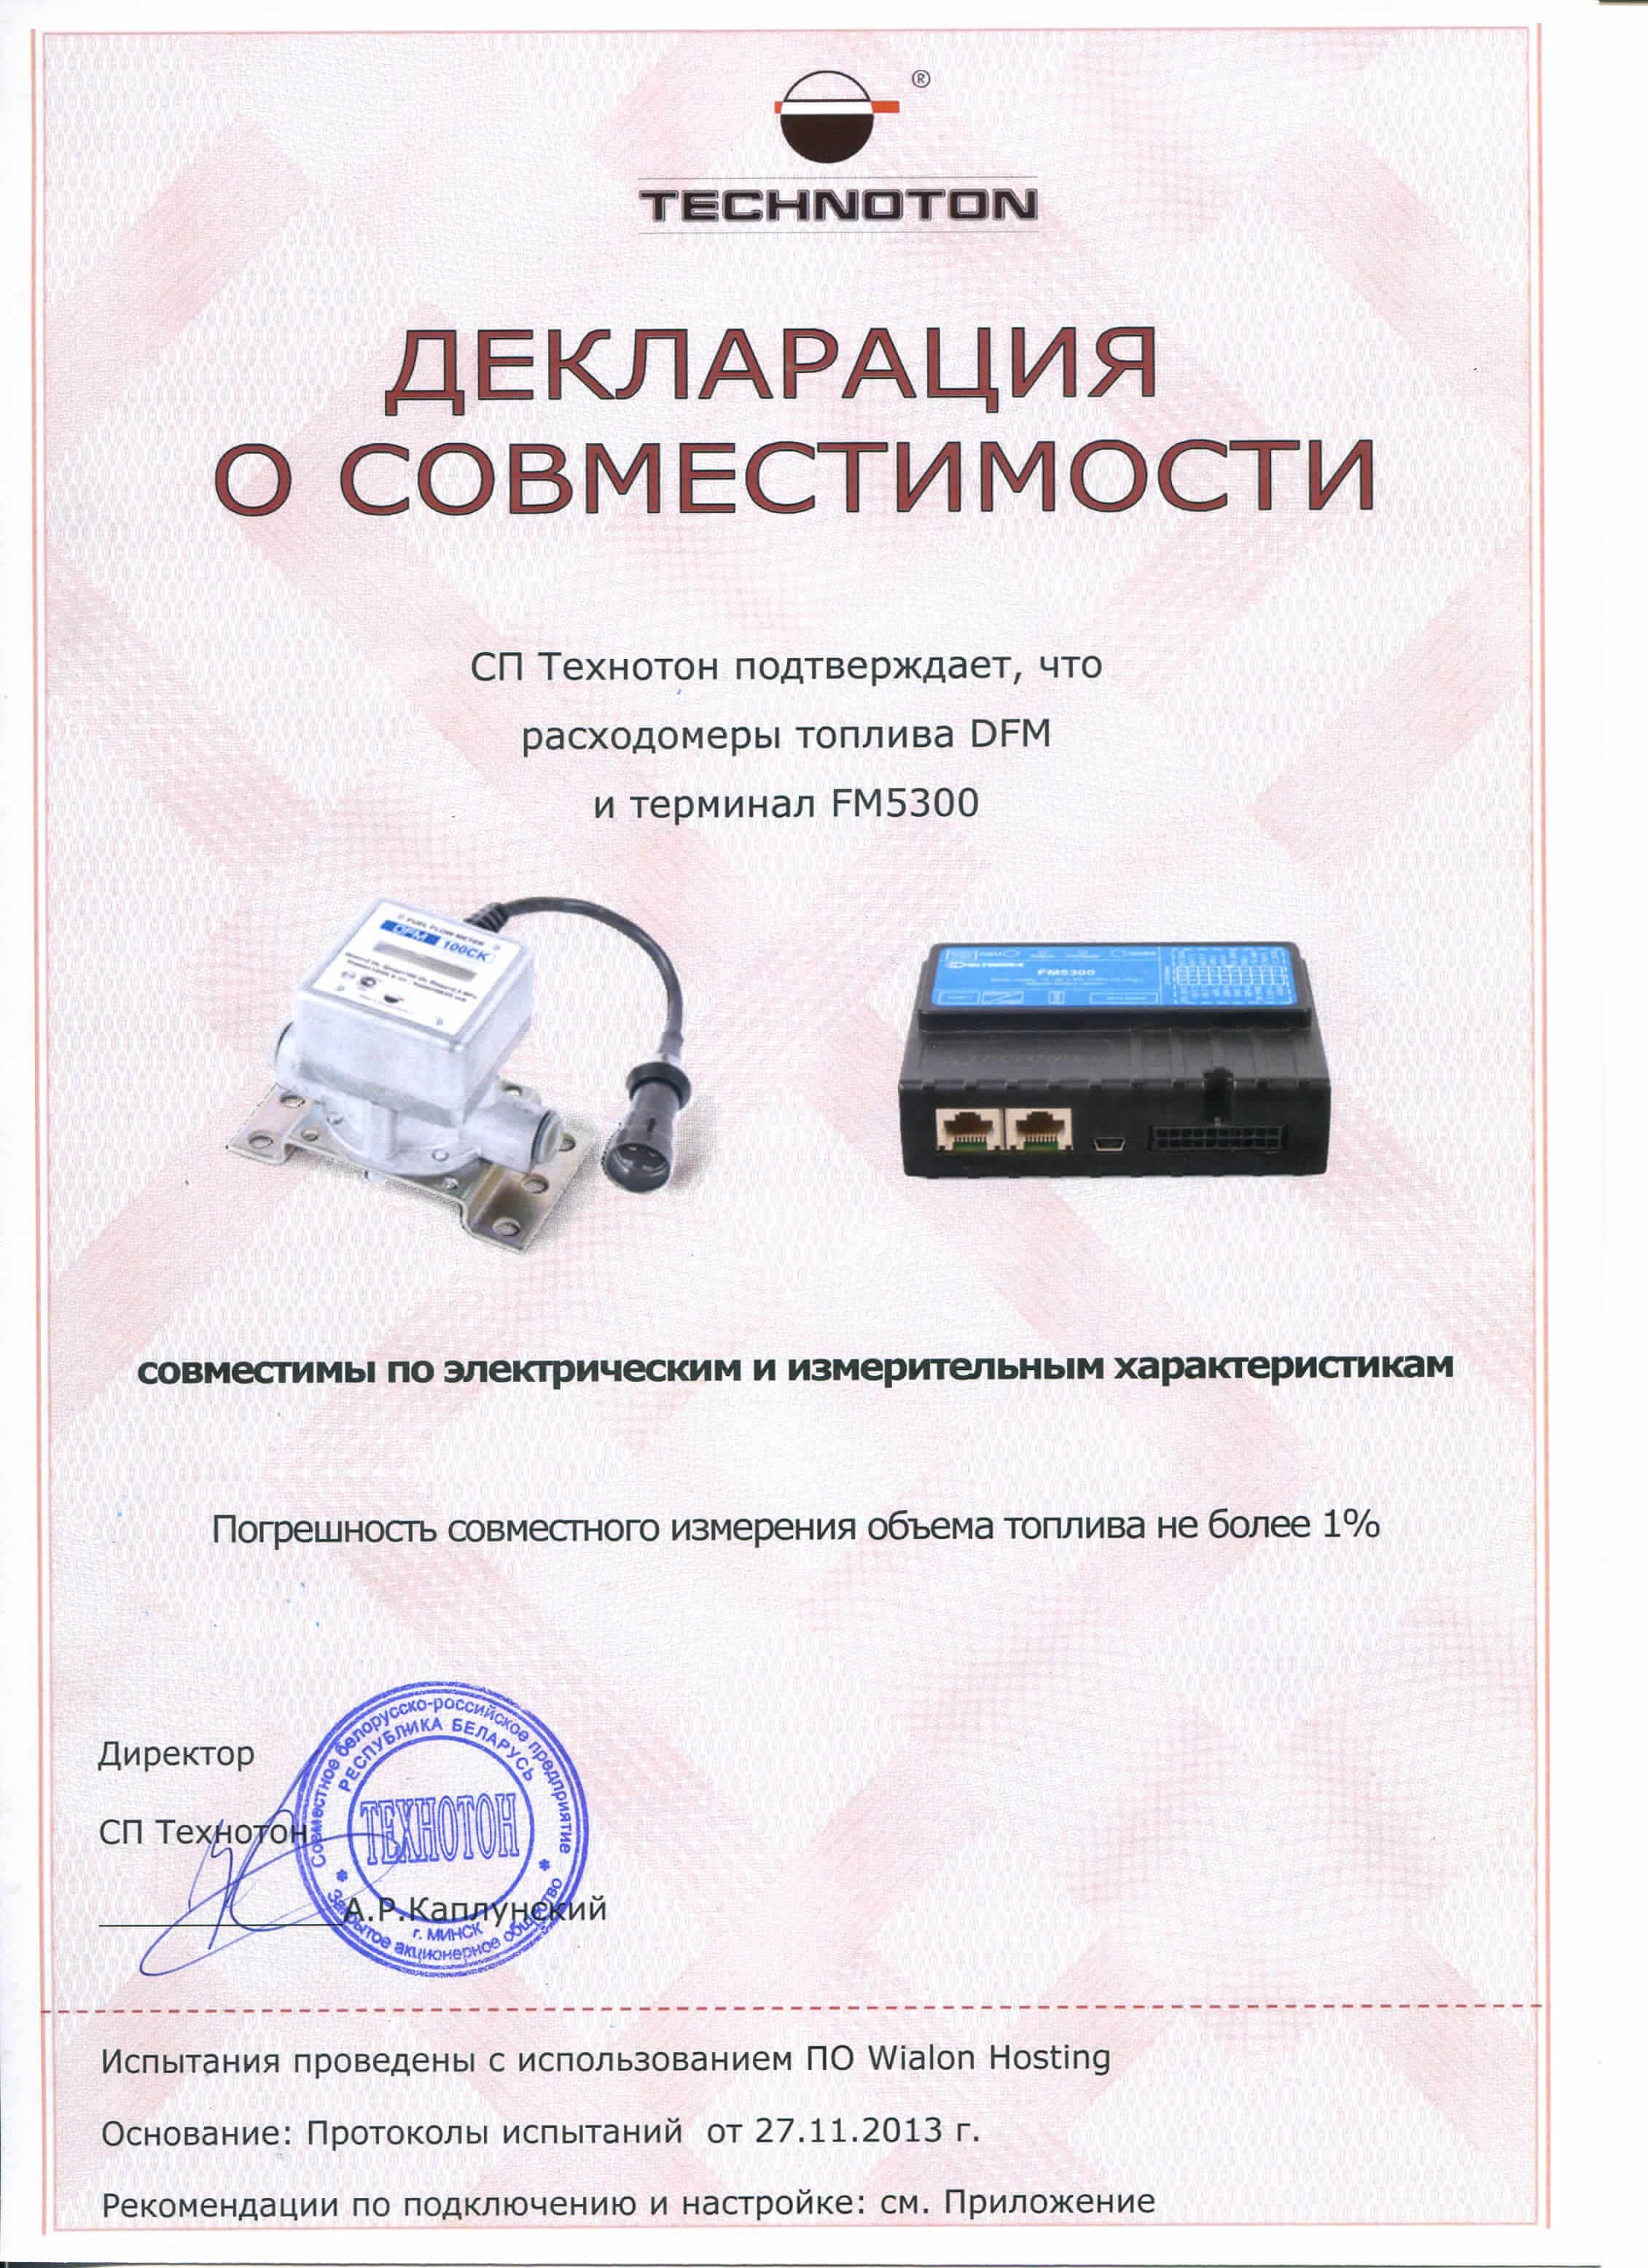 DUT-E AK, CK совместим с Teltonica FM5300